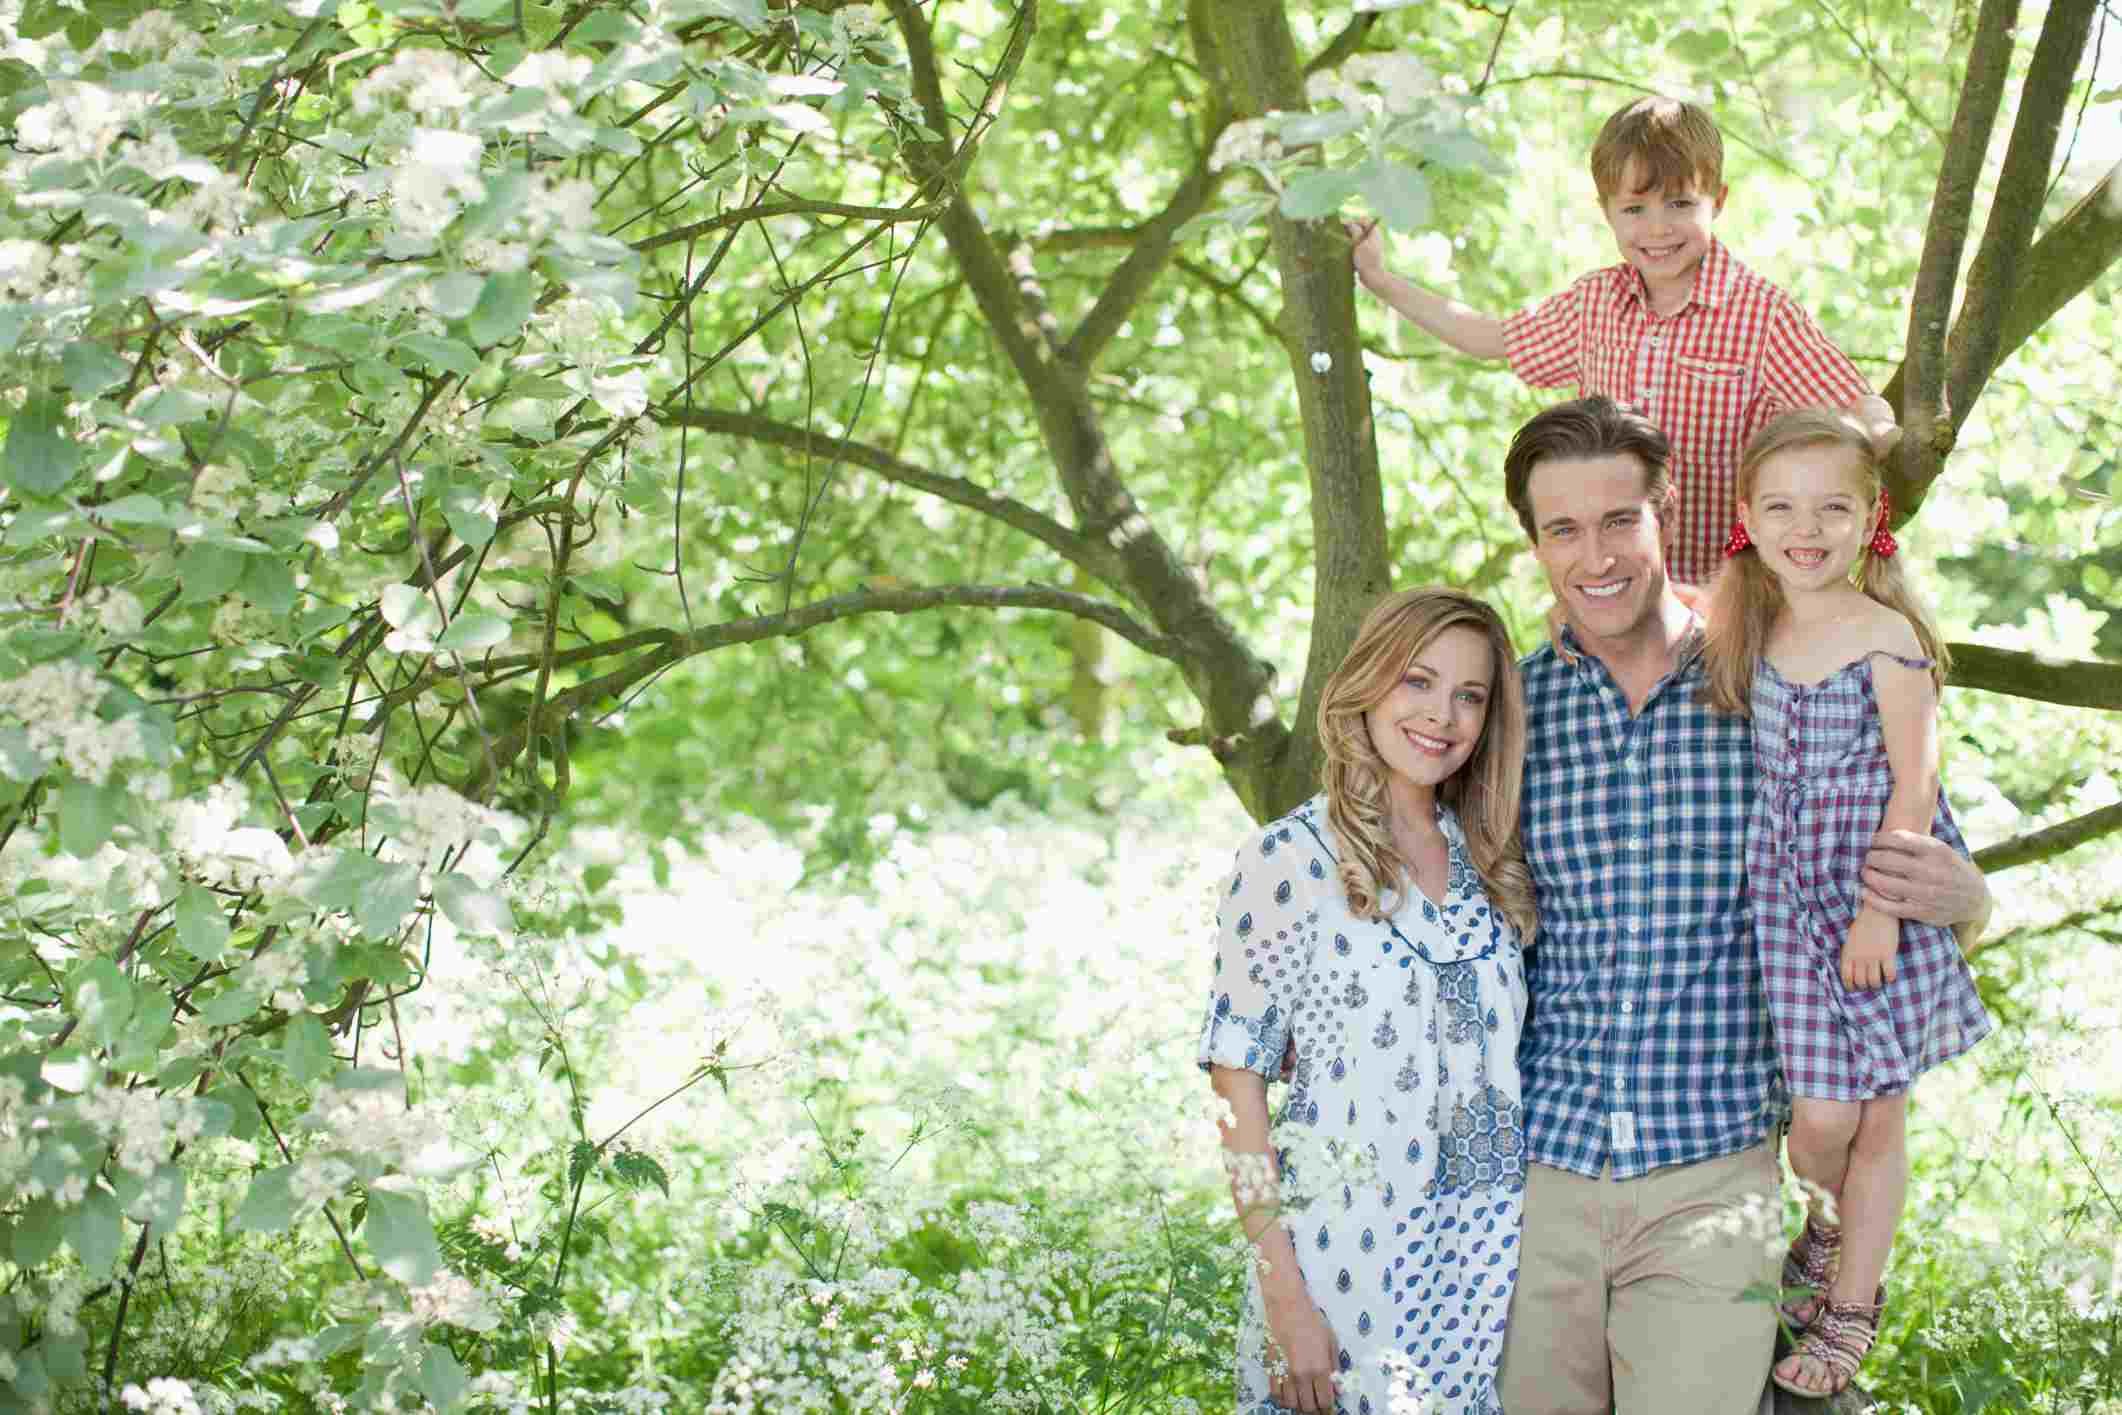 Padre y familia al aire libre